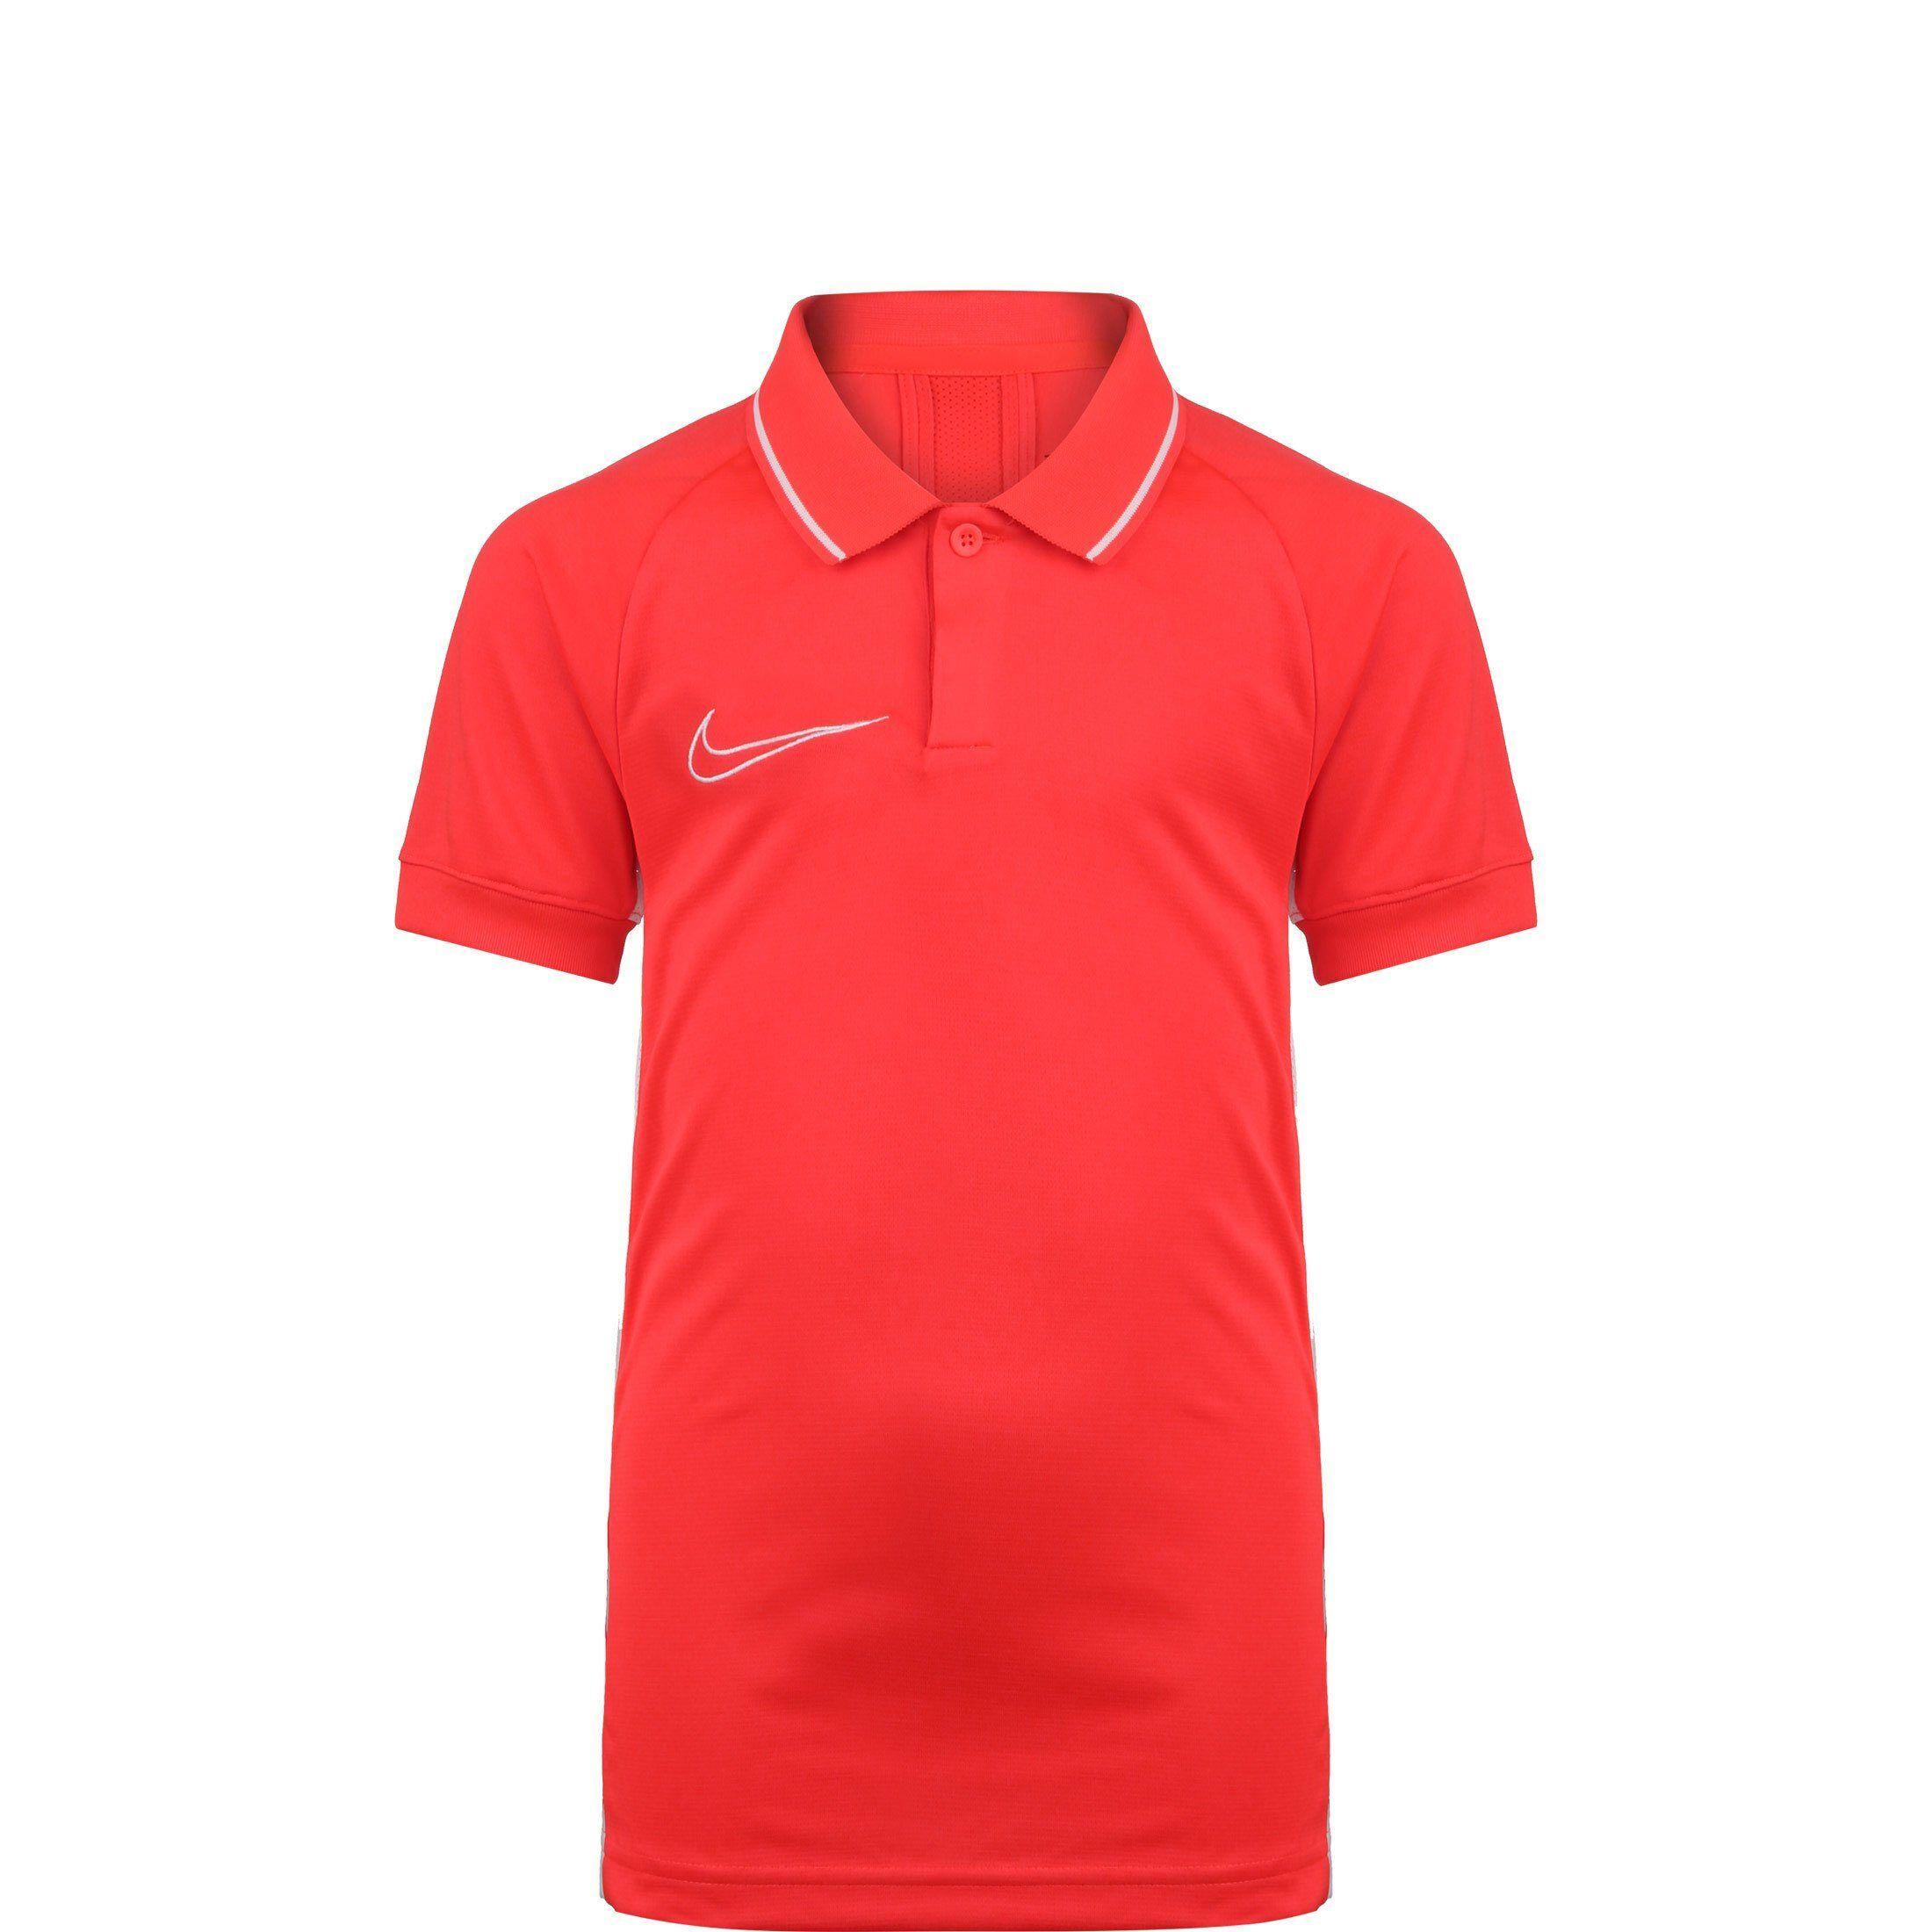 Nike Poloshirt »Dry Academy 19«, bright crimson / white